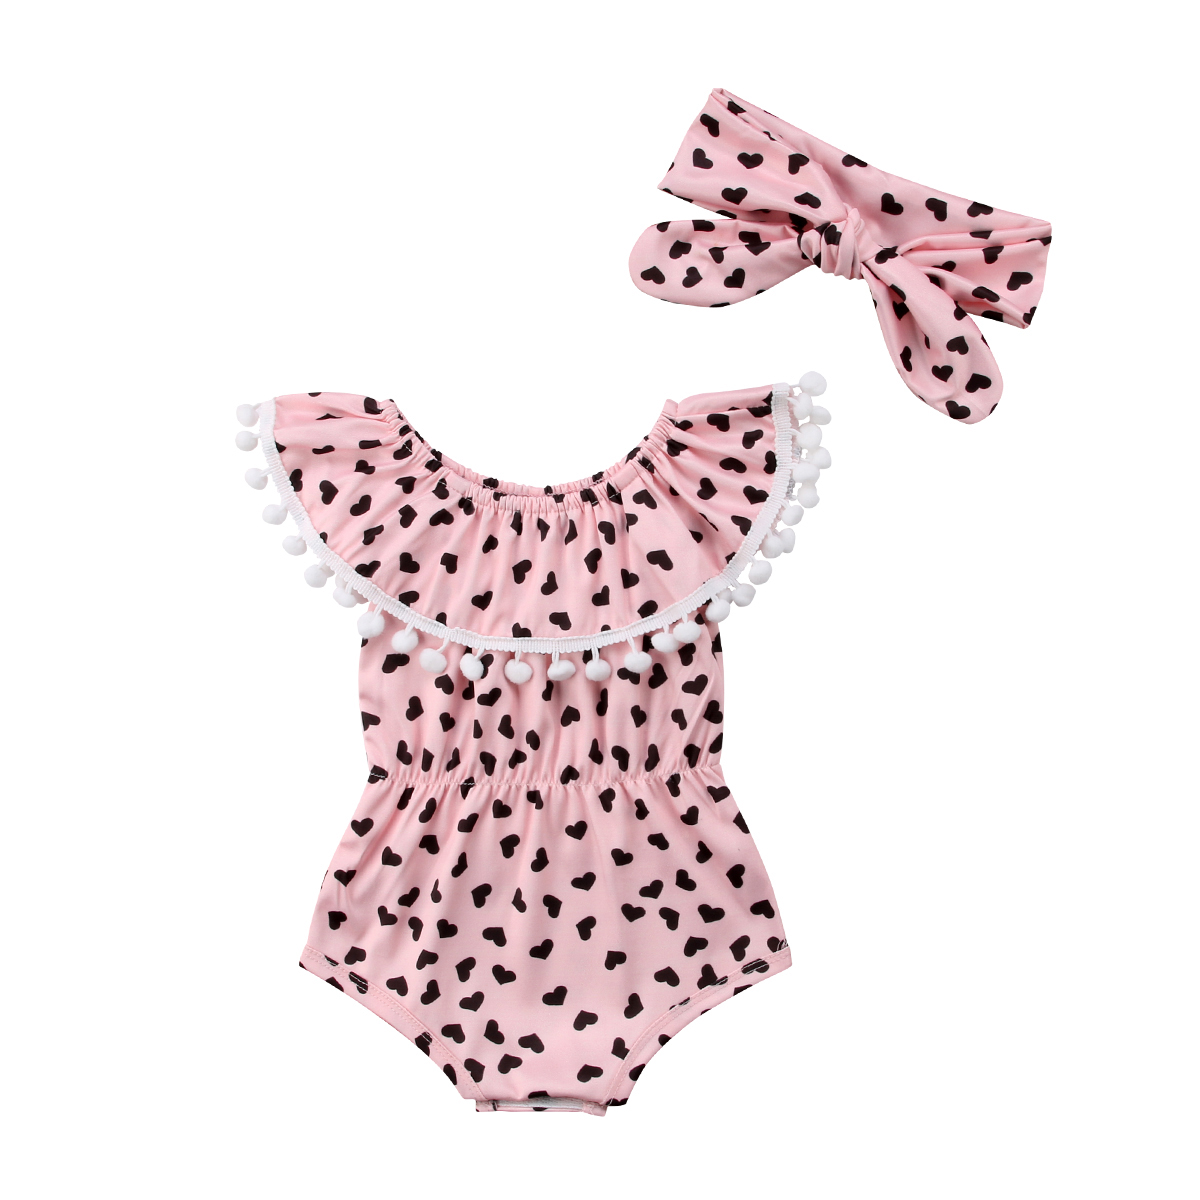 New 2018 Infant Baby Girl Off Shoulder Collar Heart Pink Bodysuit Jumpsuit 2Pcs Outfits Sweet Summer Cute Sunsuit